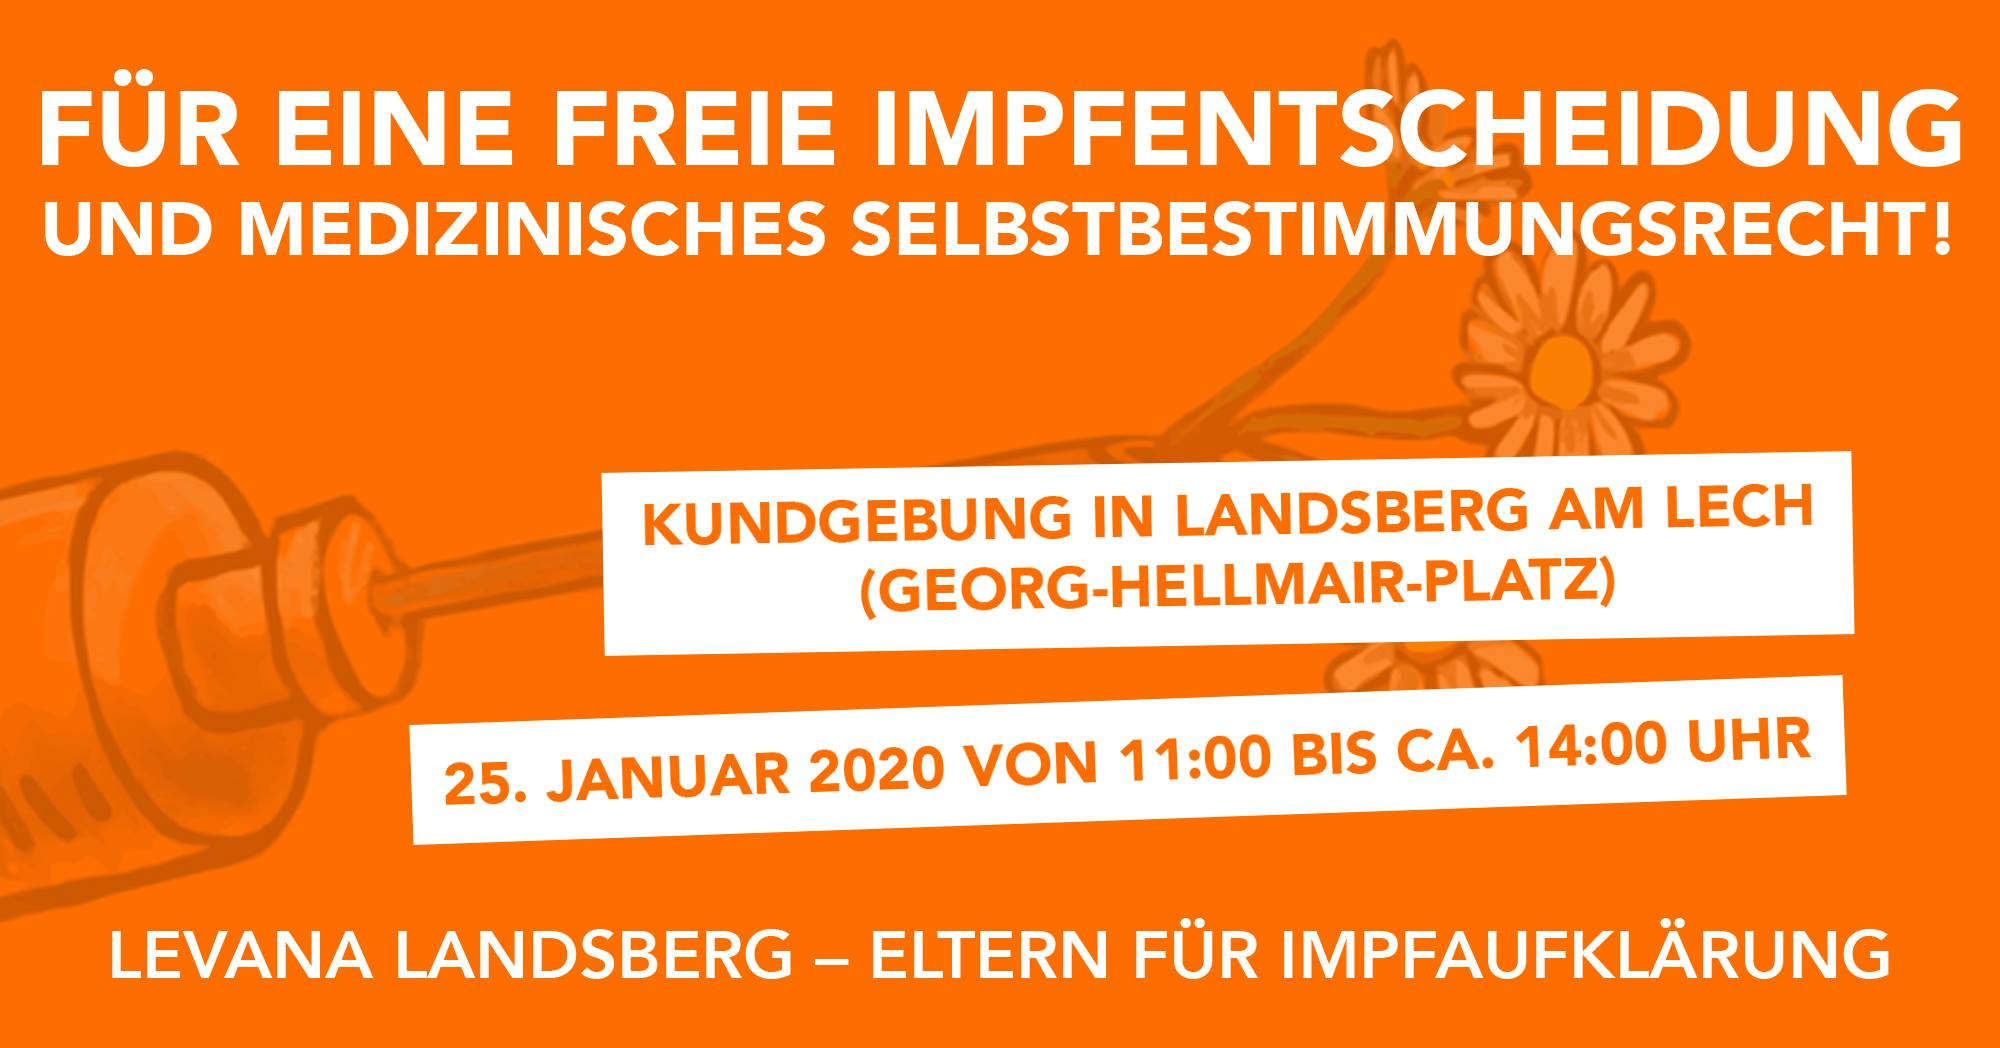 25.01.2020: Demo in Landsberg am Lech